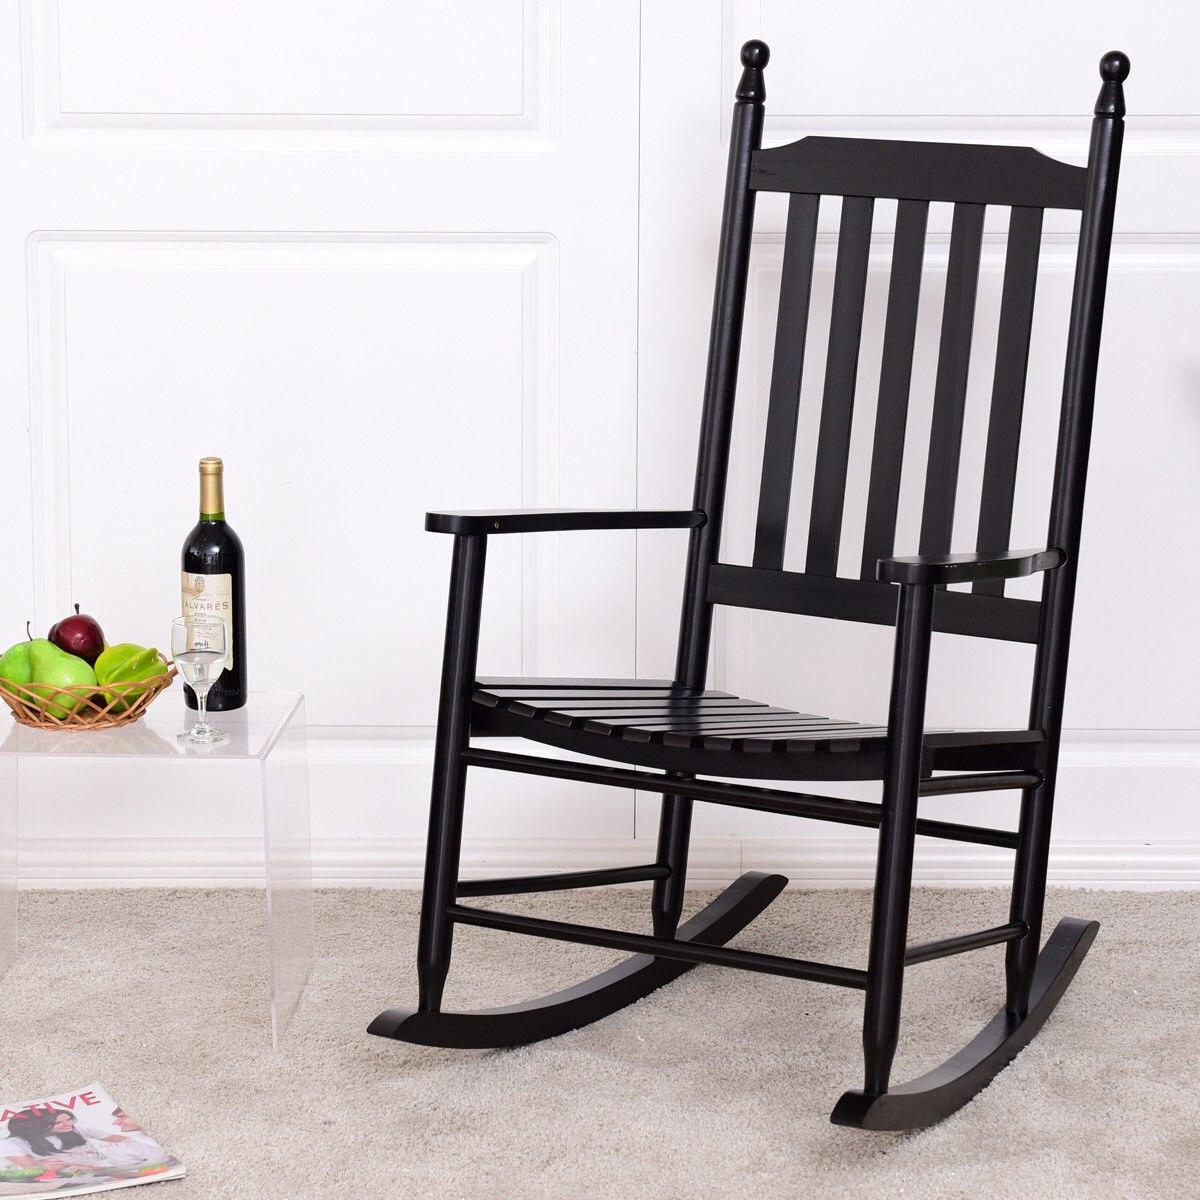 Giantex Wooden Rocking Chair Porch Rocker Modern Armchair Balcony Deck Garden Furniture HW56354BK цена и фото